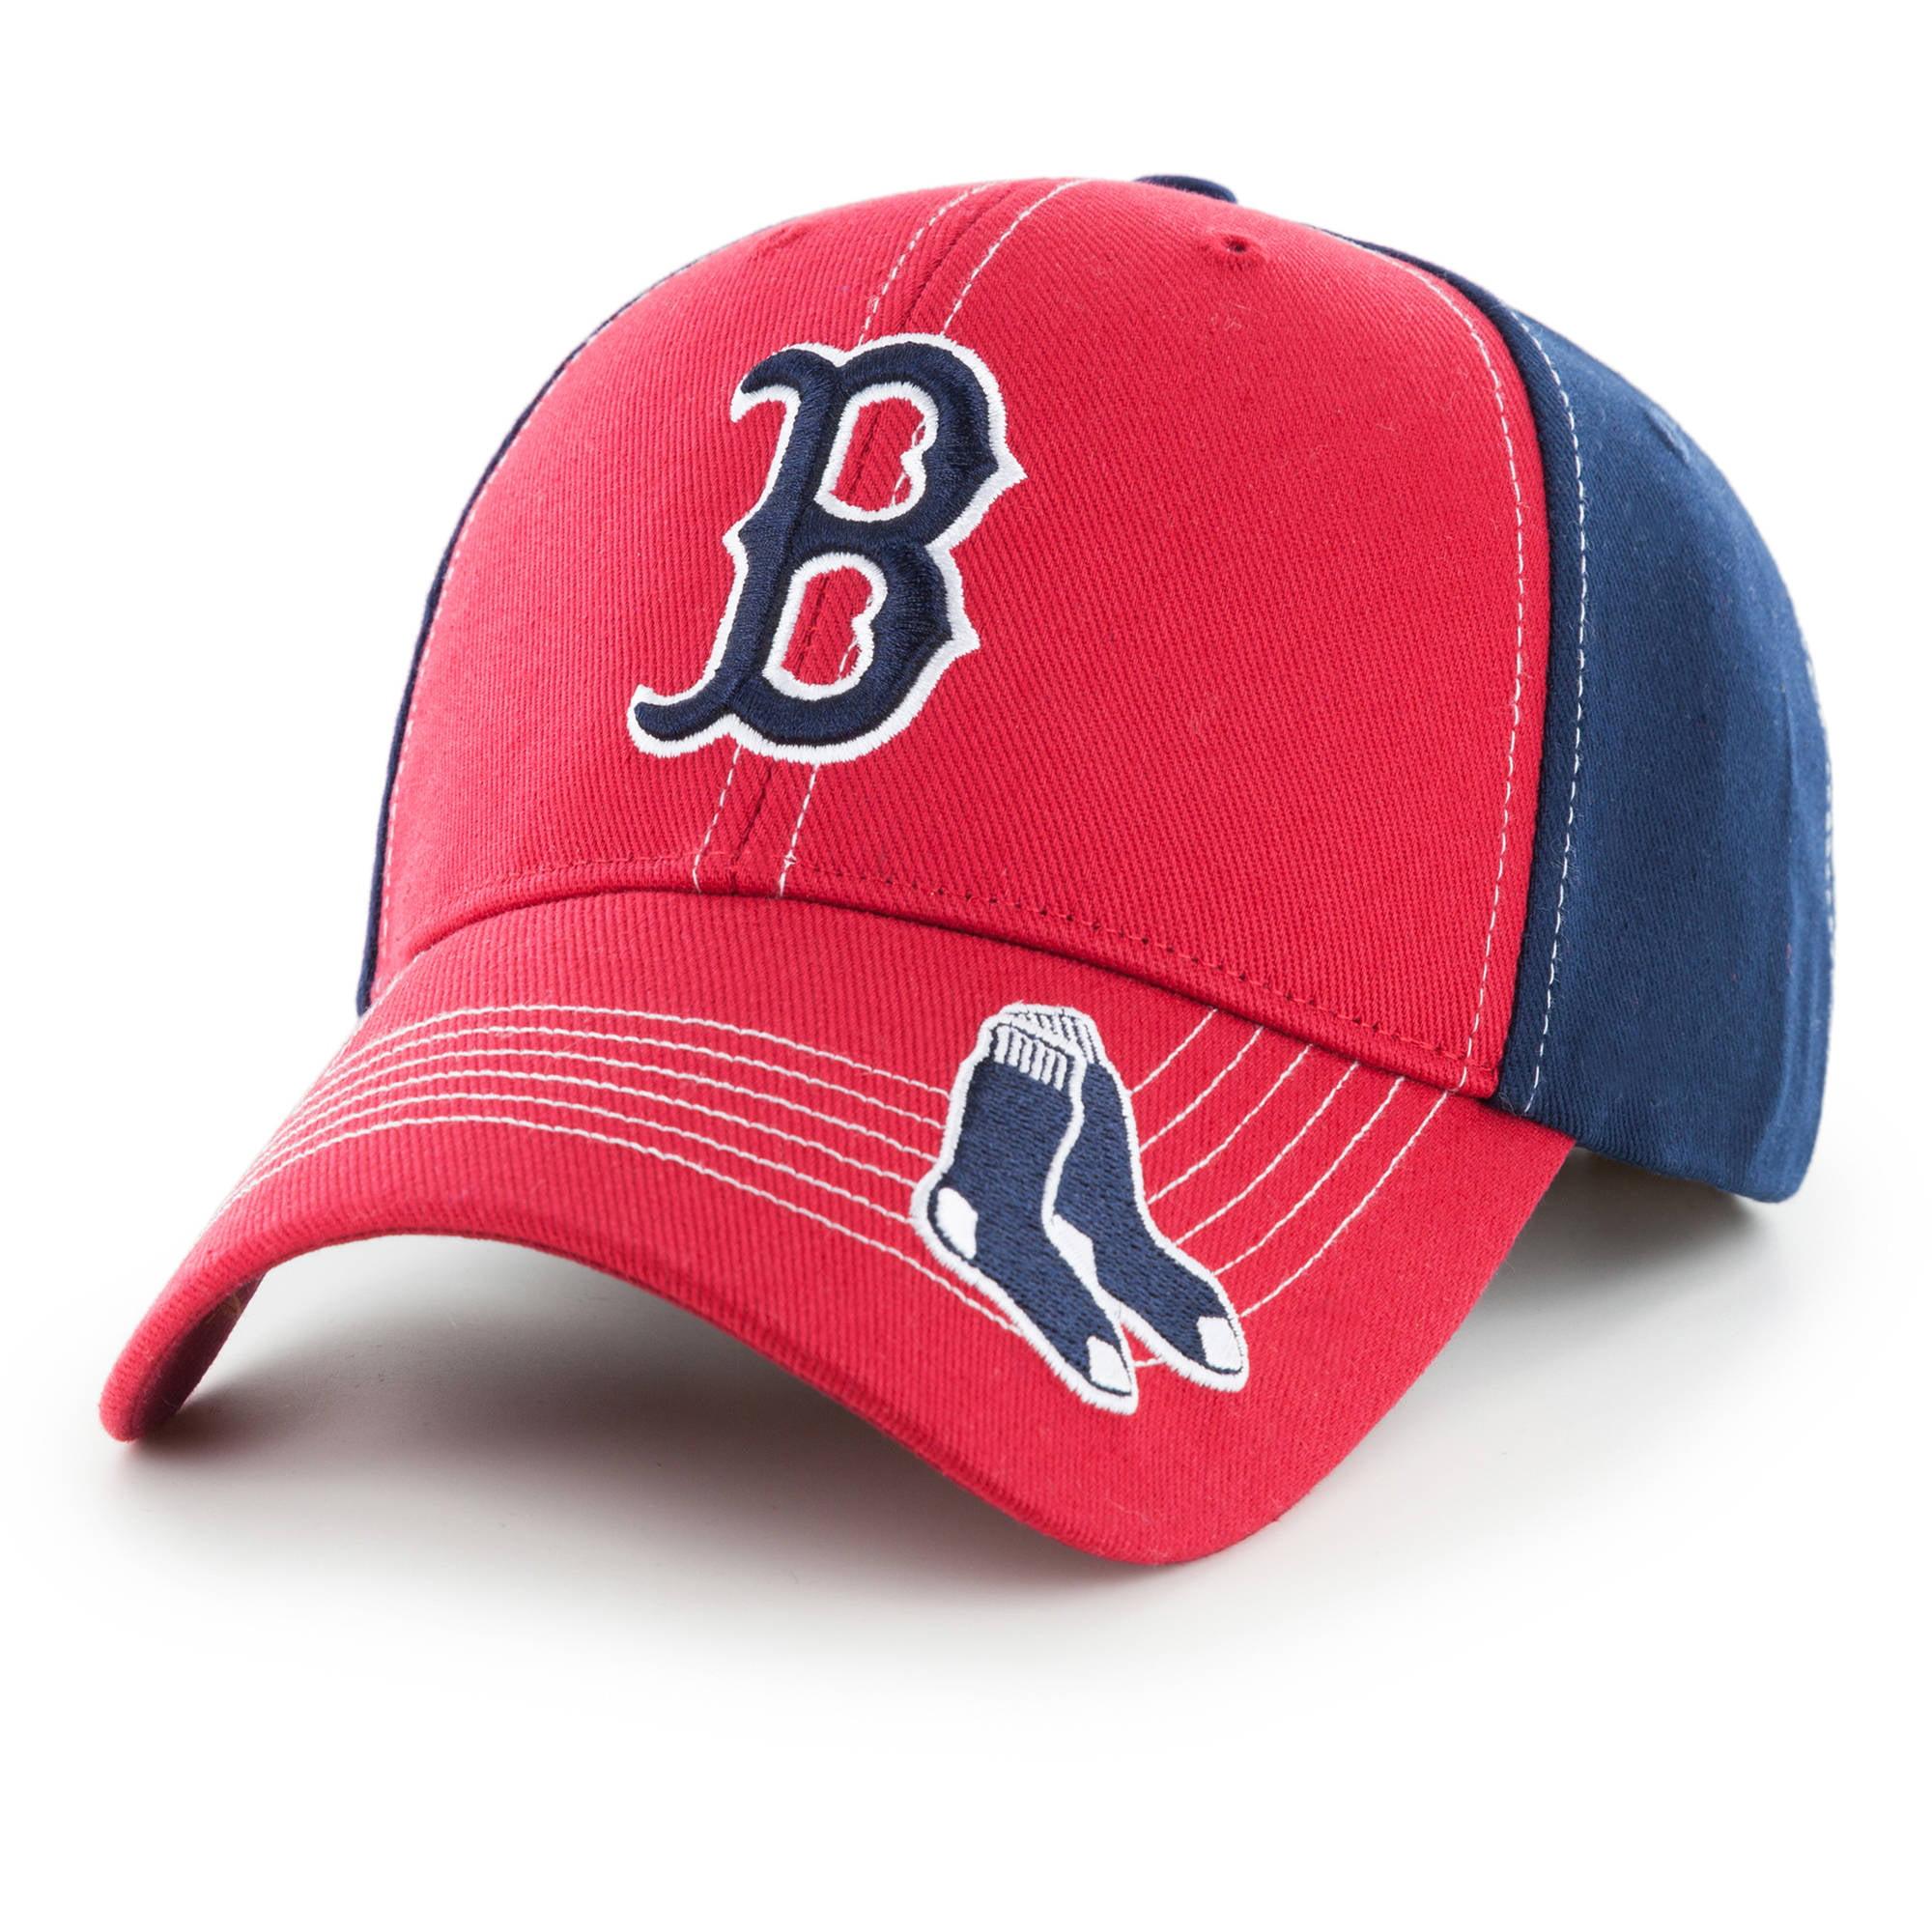 MLB Boston Red Sox  Revolver Cap / Hat  - Fan Favorite